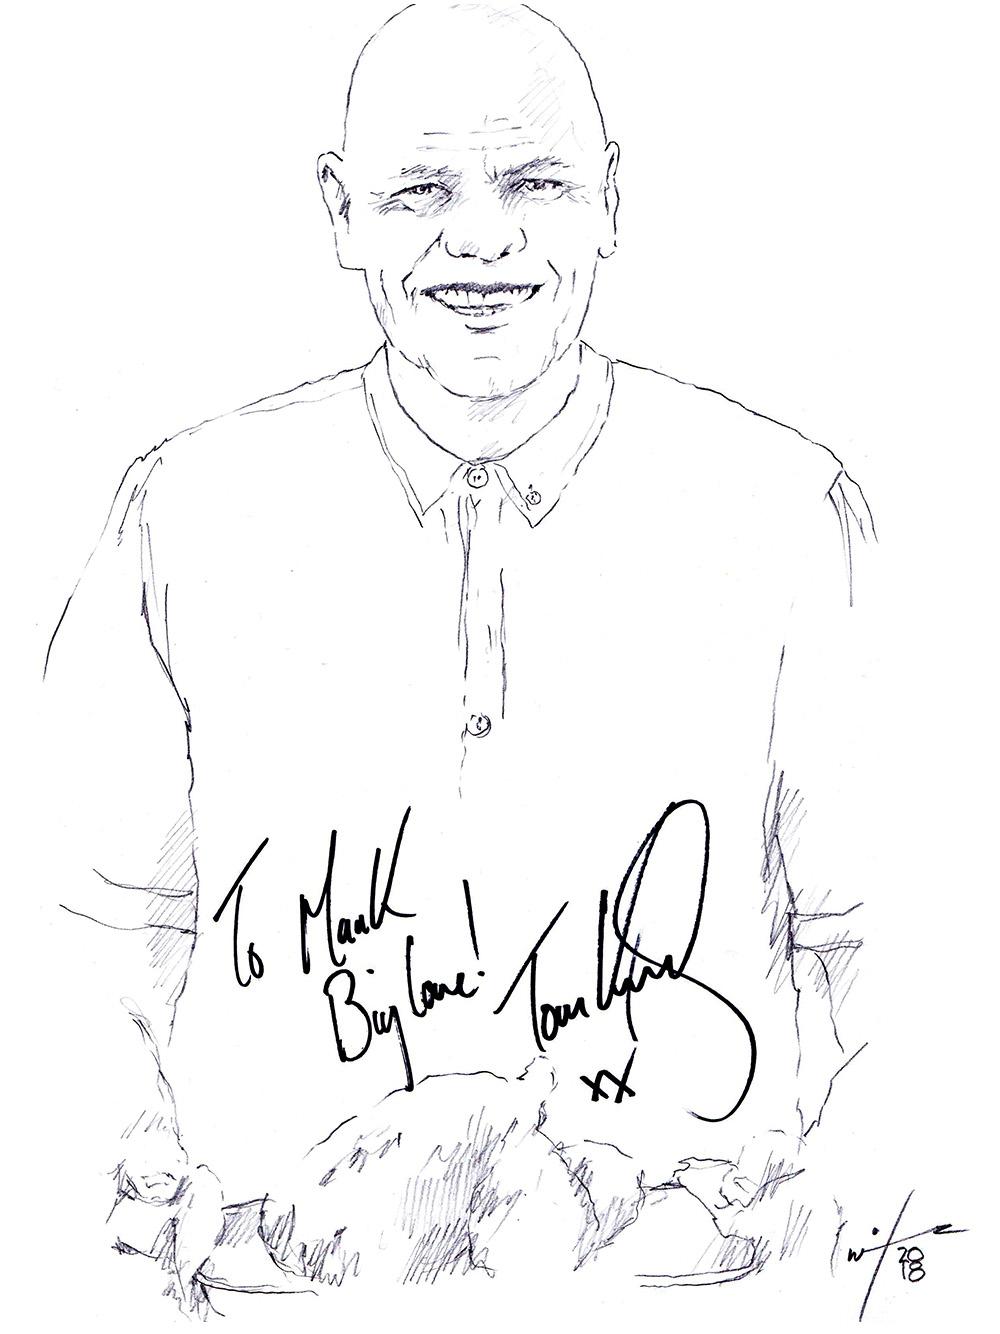 Autographed drawing of chef Tom Kerridge